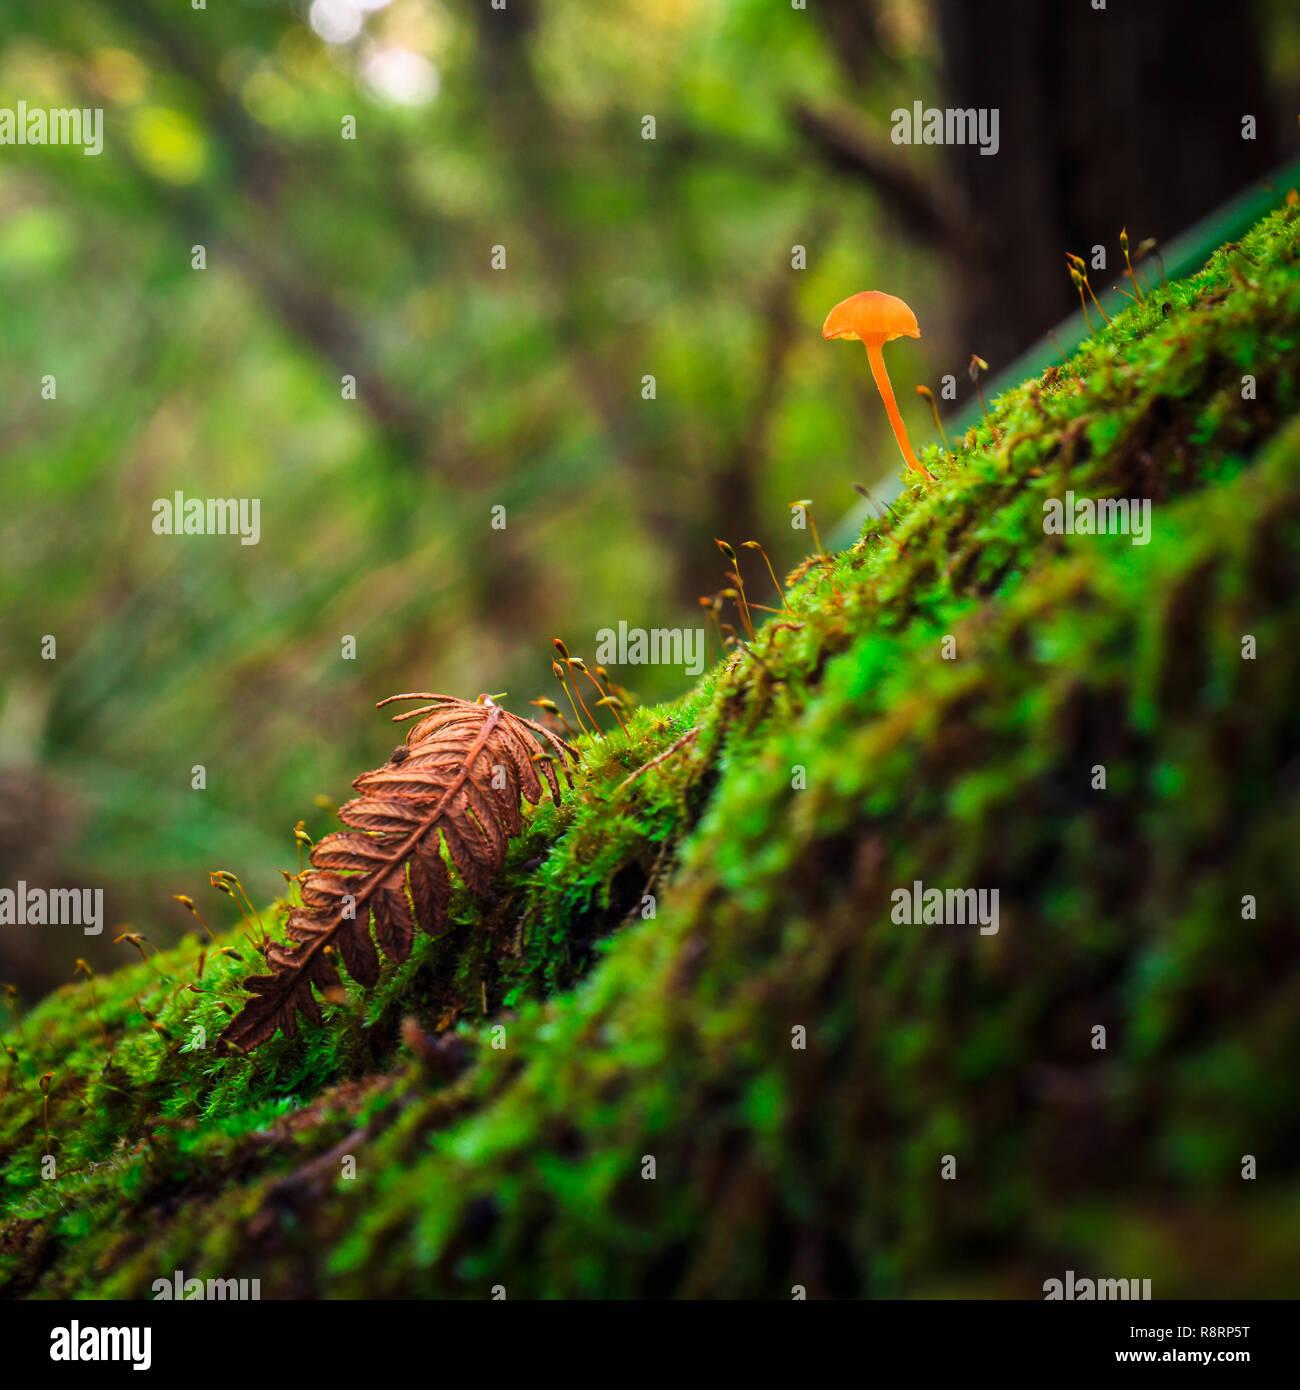 Forest Mushroom - Stock Image